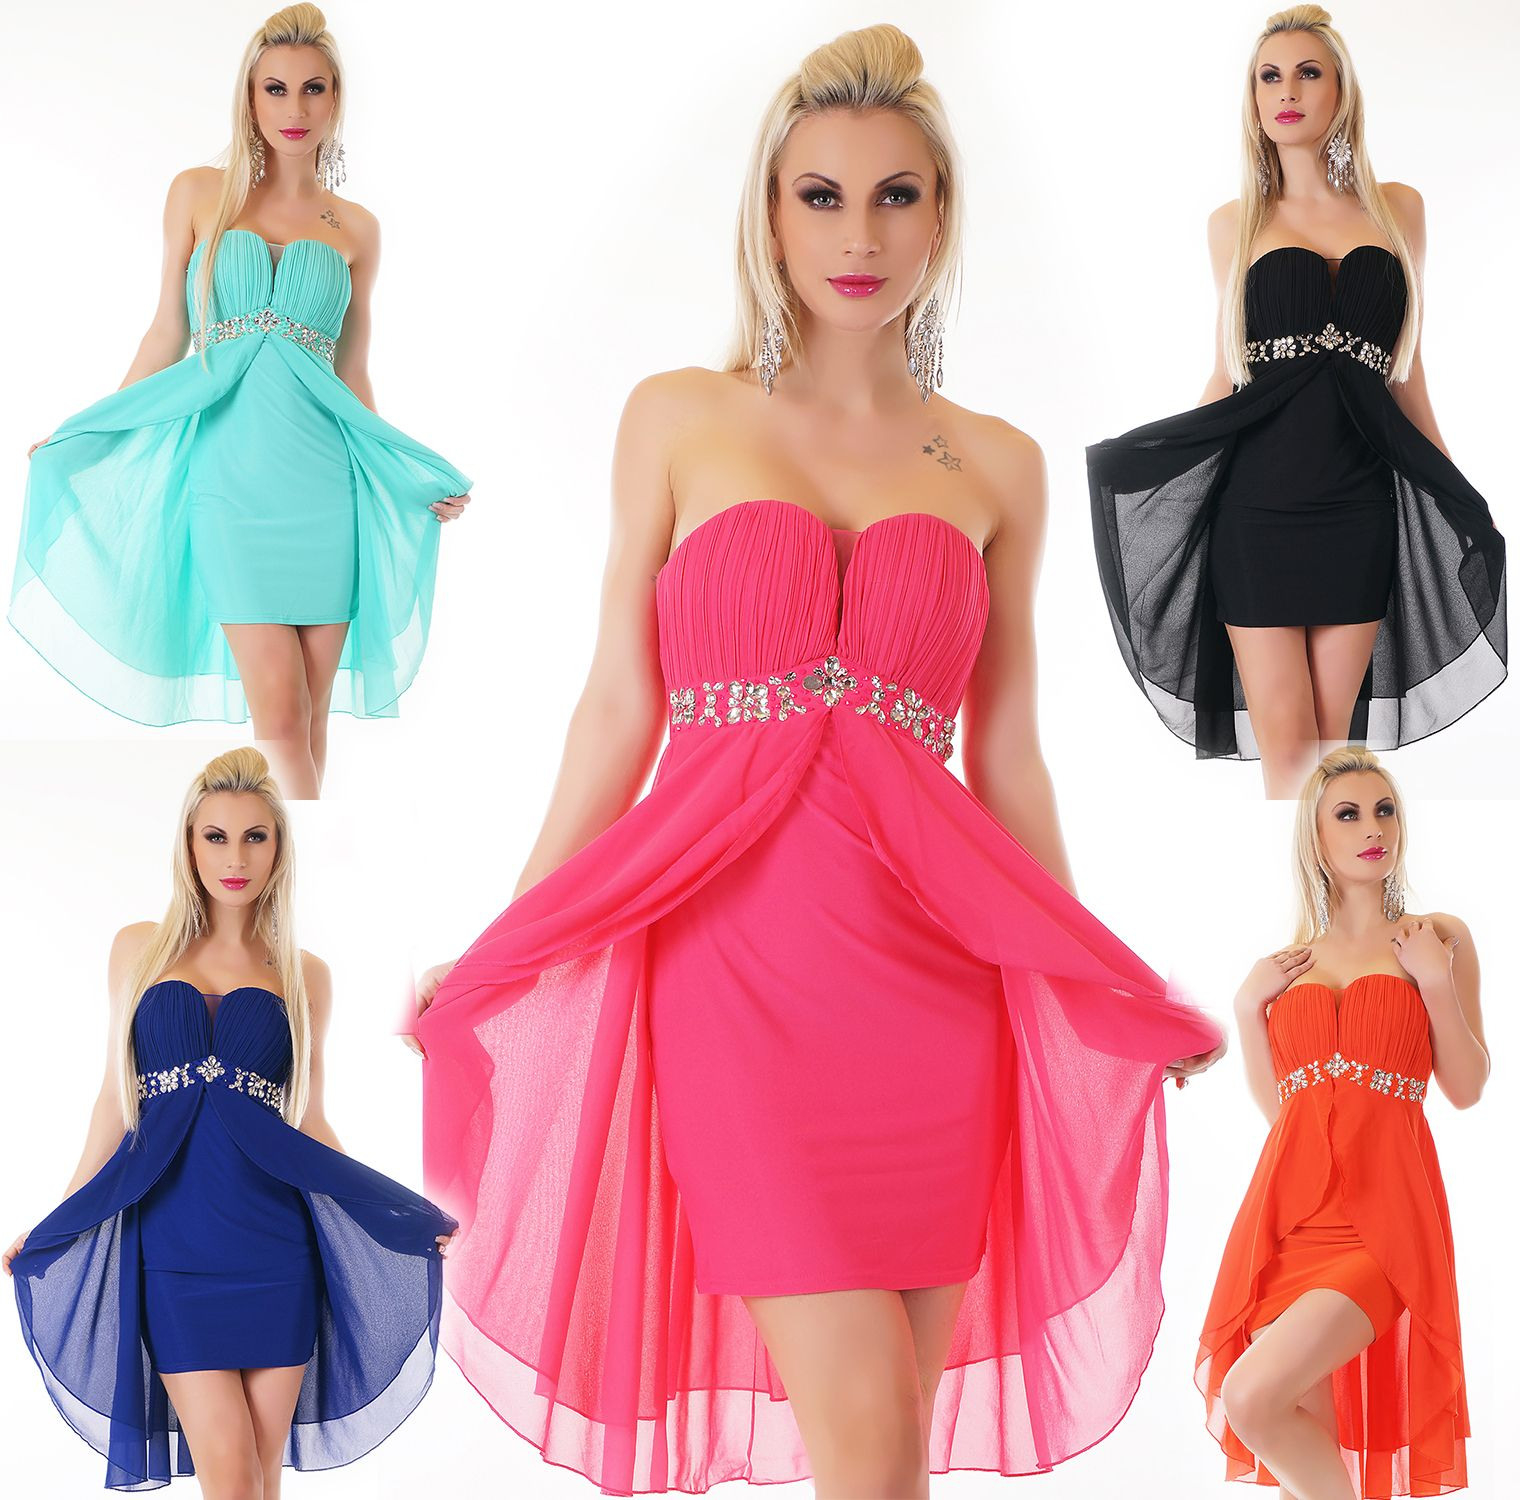 Designer Großartig Abend-Vokuhila-Kleid Vertrieb17 Cool Abend-Vokuhila-Kleid Ärmel